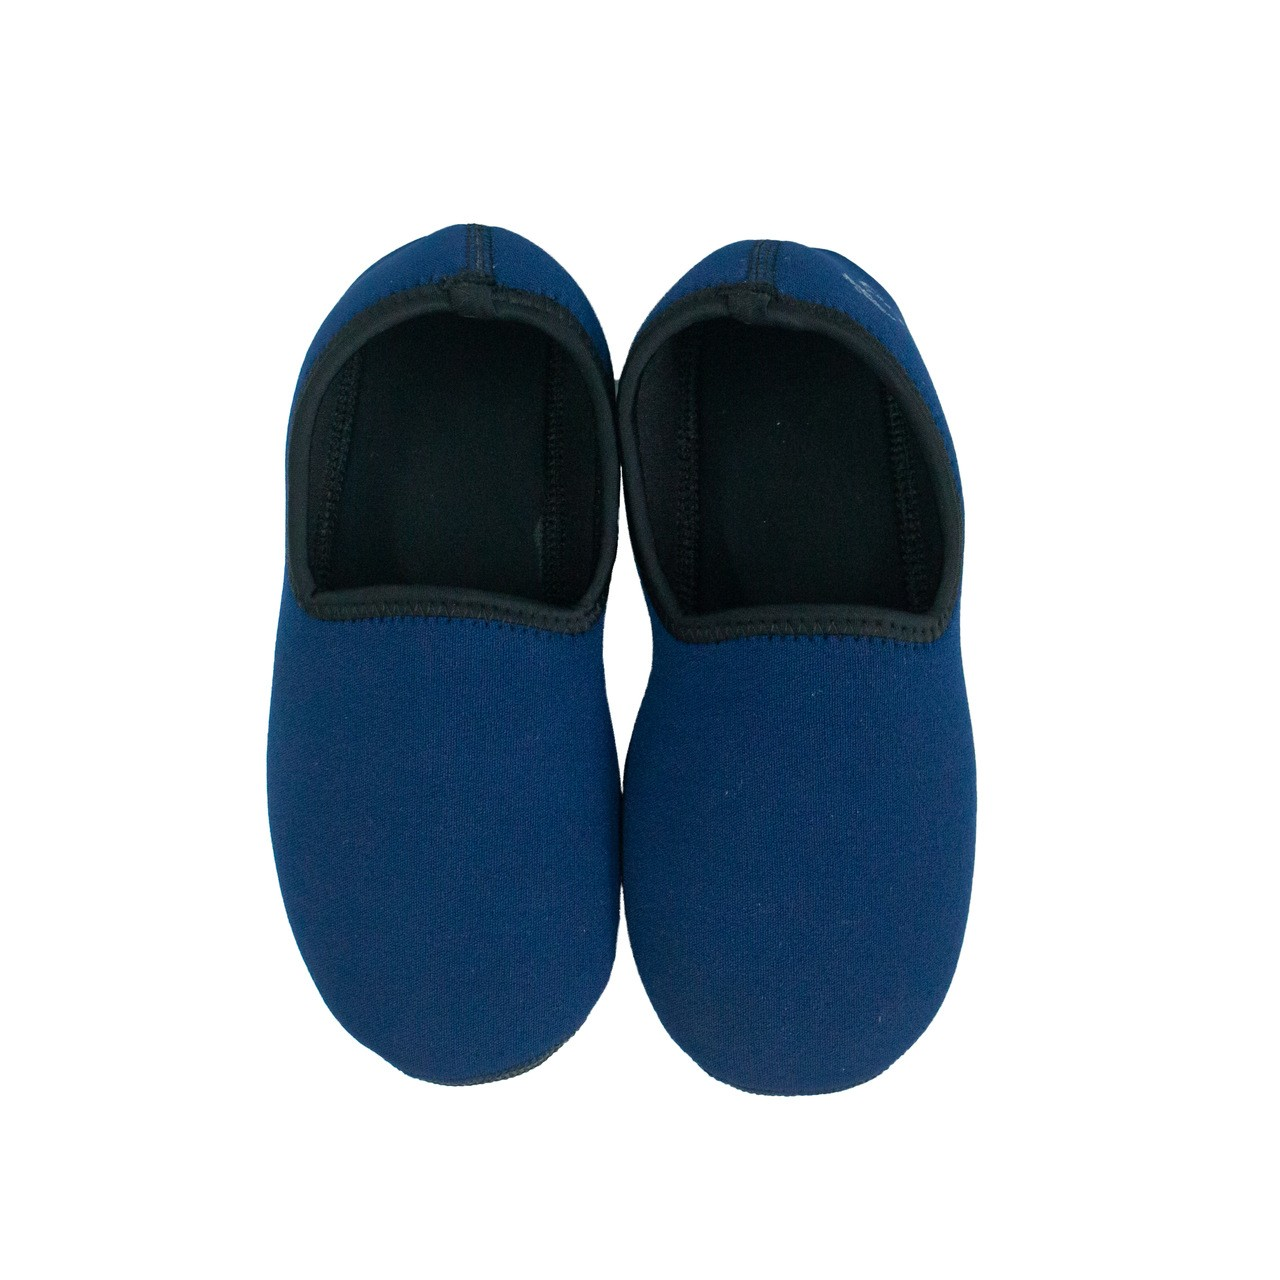 Ufrog Infantil Antiderrapante azul marinho